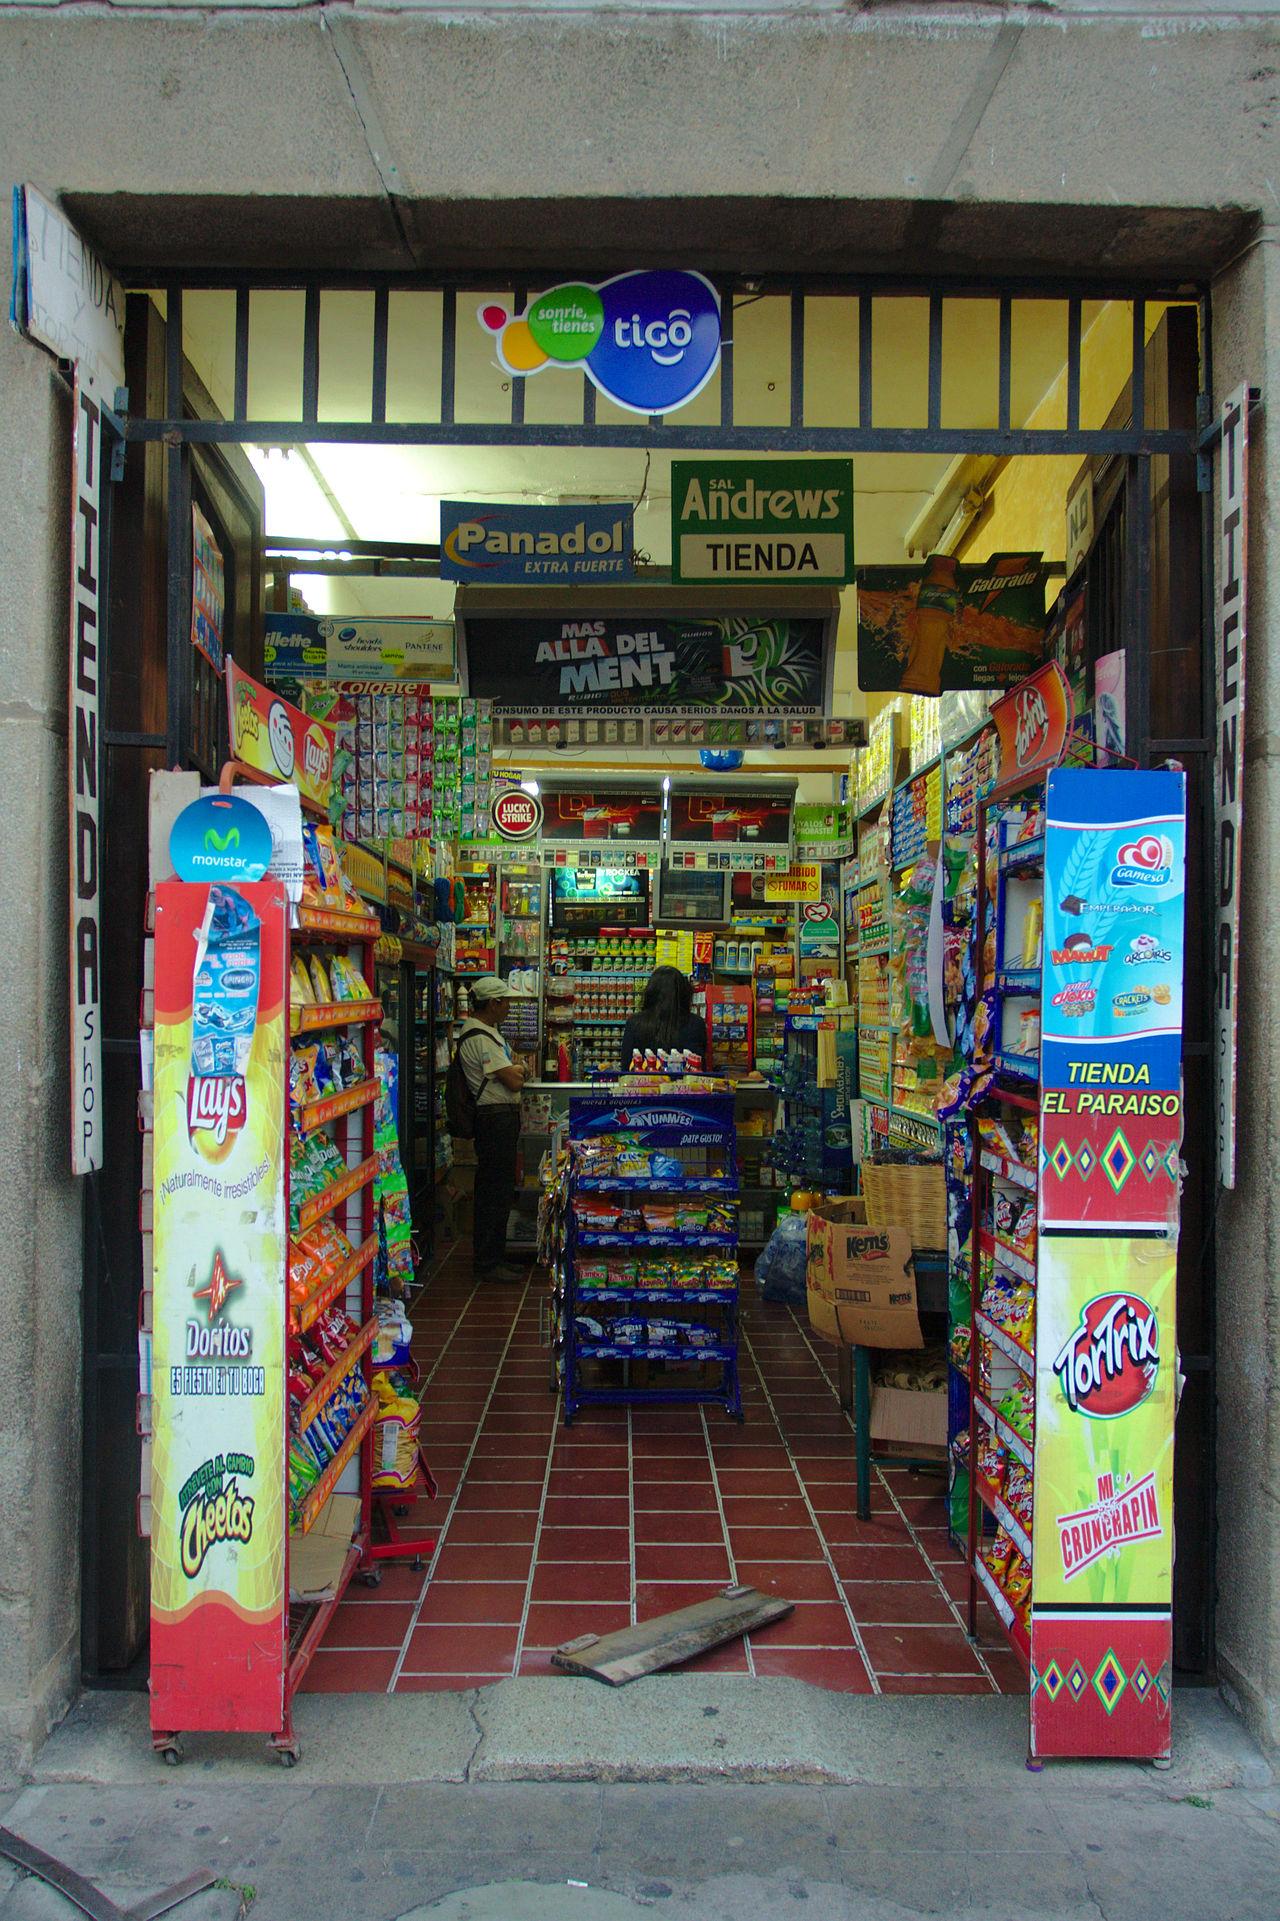 Fine Art Photography Little Street Shop Market Shopping Marketplace Multi Colored Old Shop Shop Still Life Storefront Stores Street Photography Tienda Urban Photography Western Guatemala